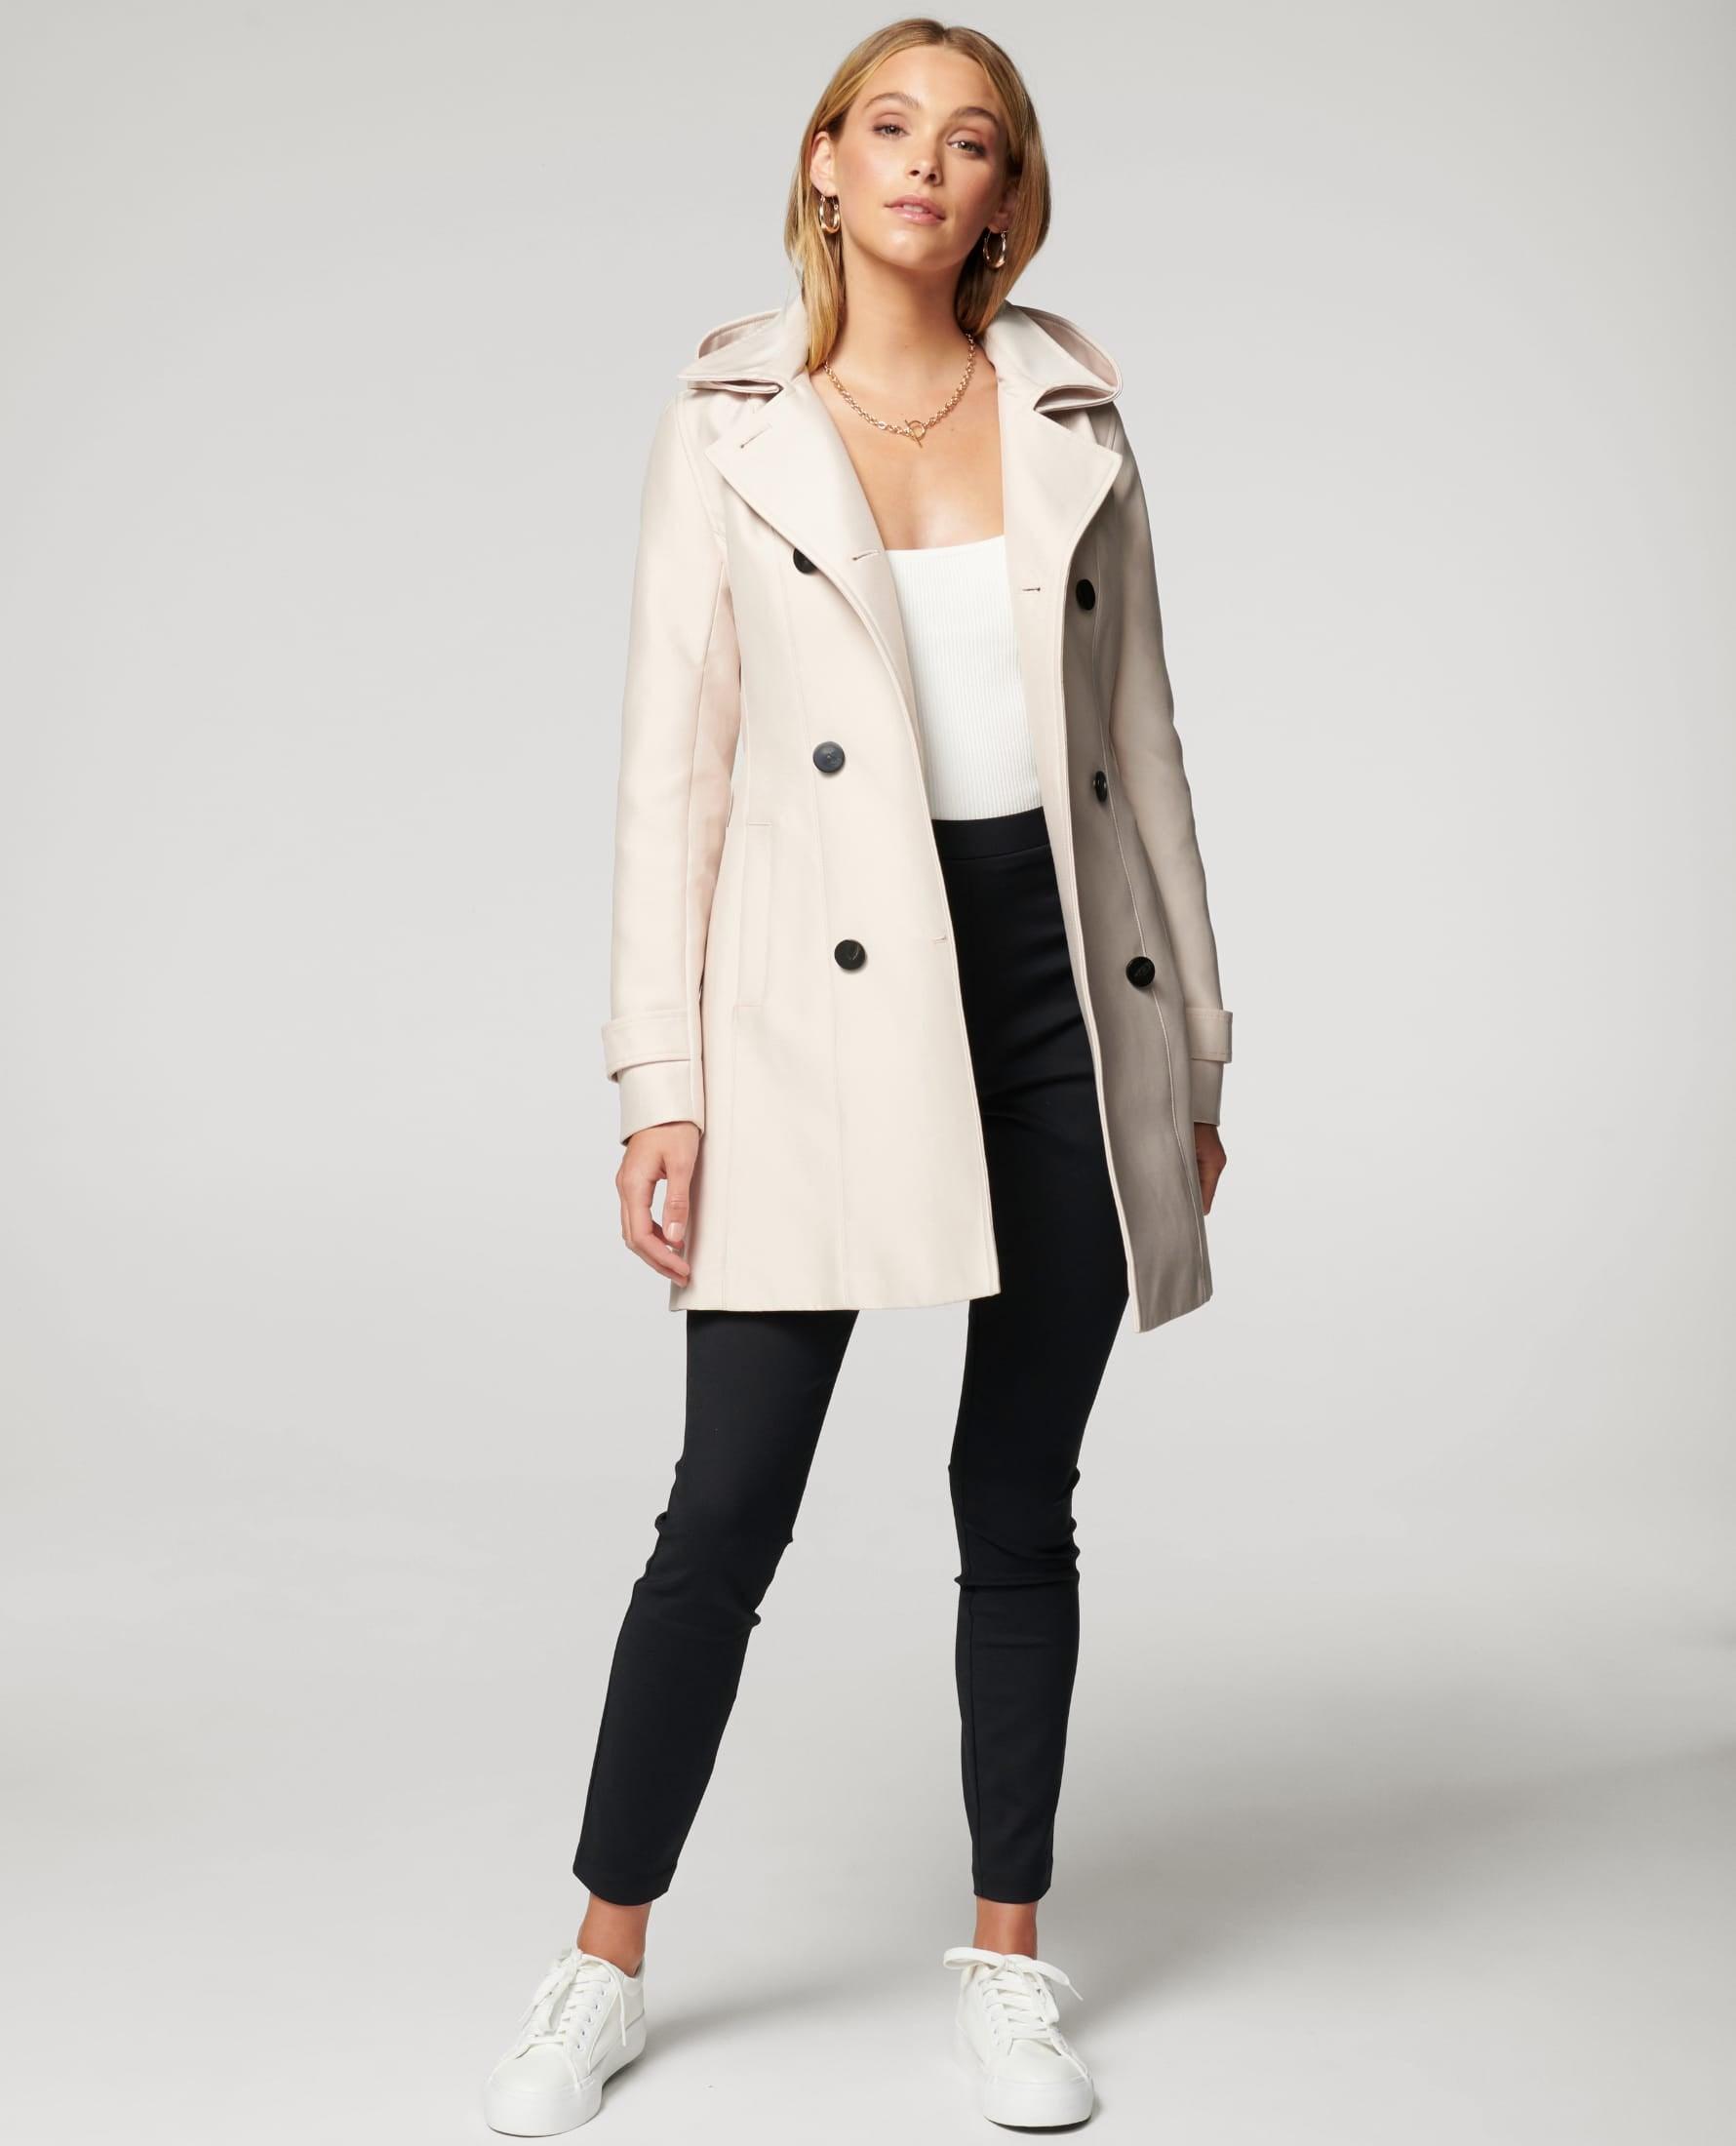 Forever New Jackets & Coats